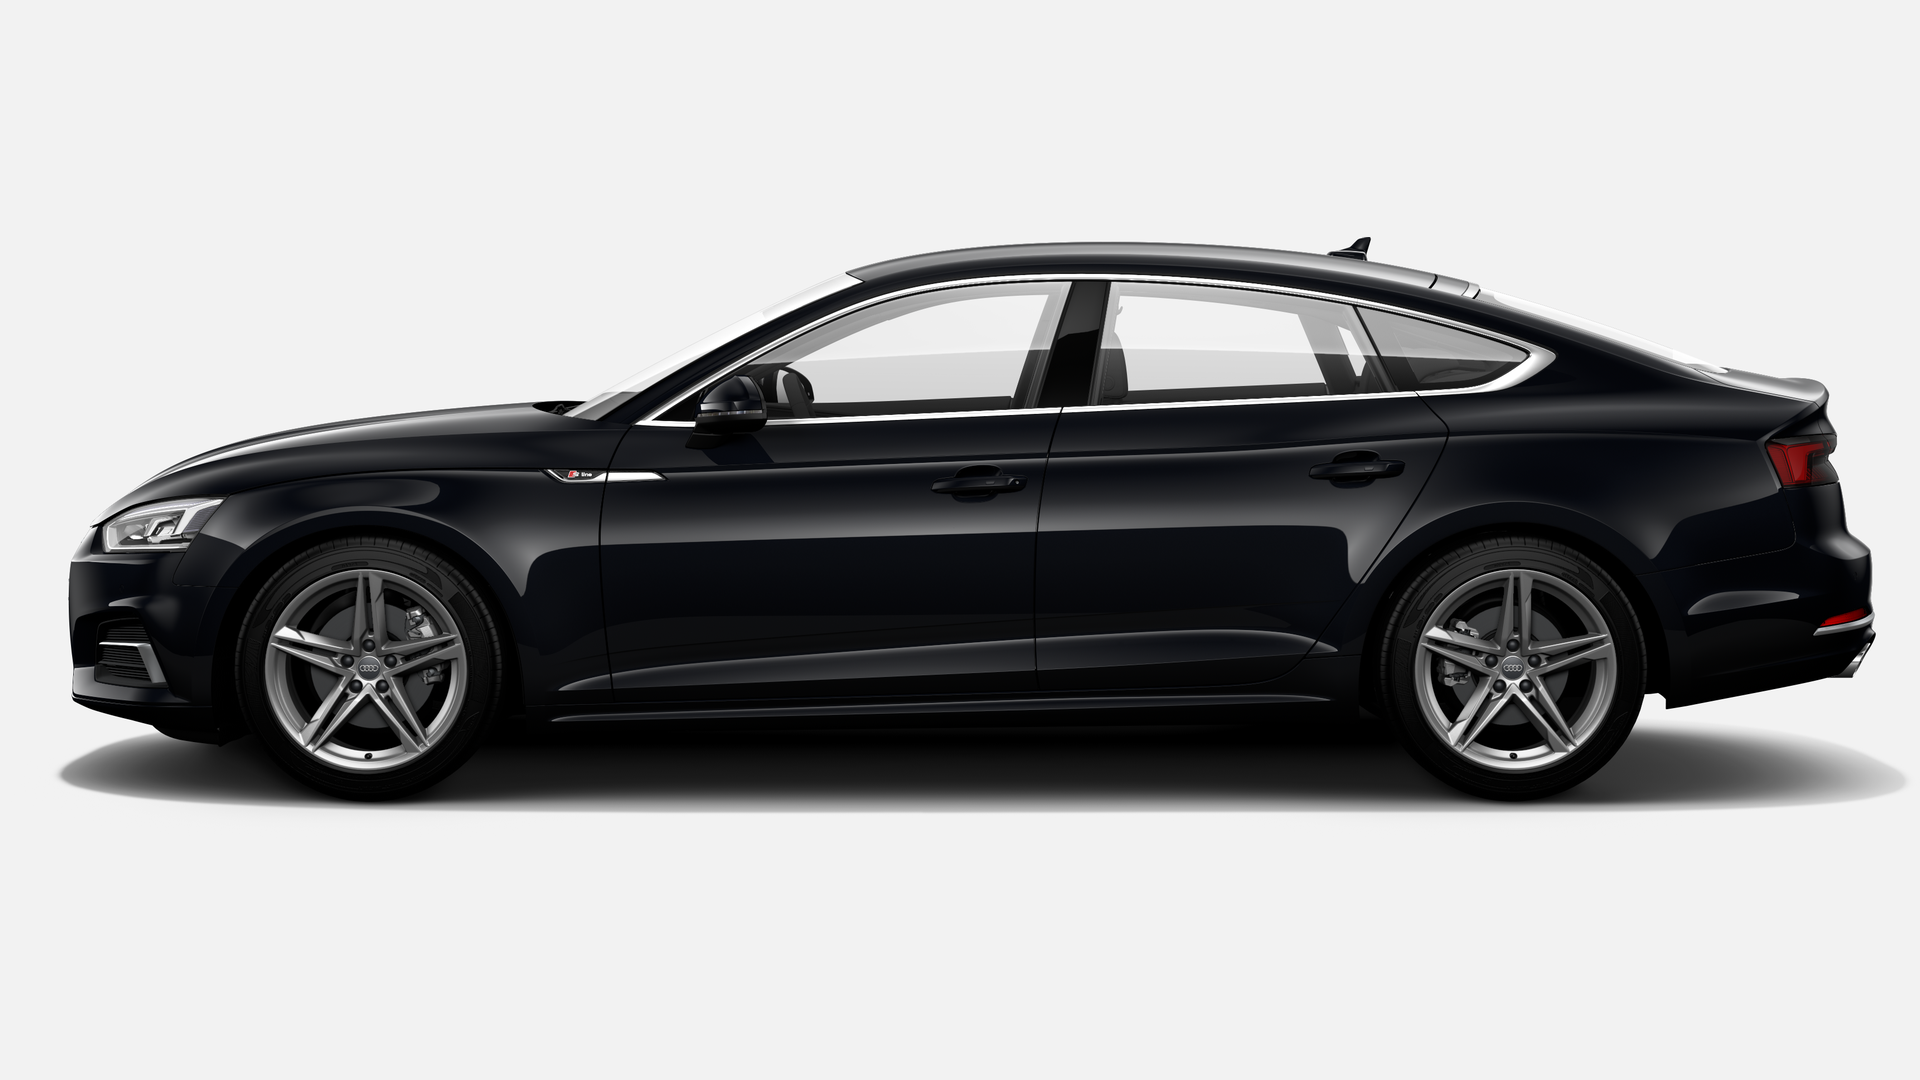 Audi A5 Sportback 2.0 TFSI Sport S tronic 140 kW (190 CV)